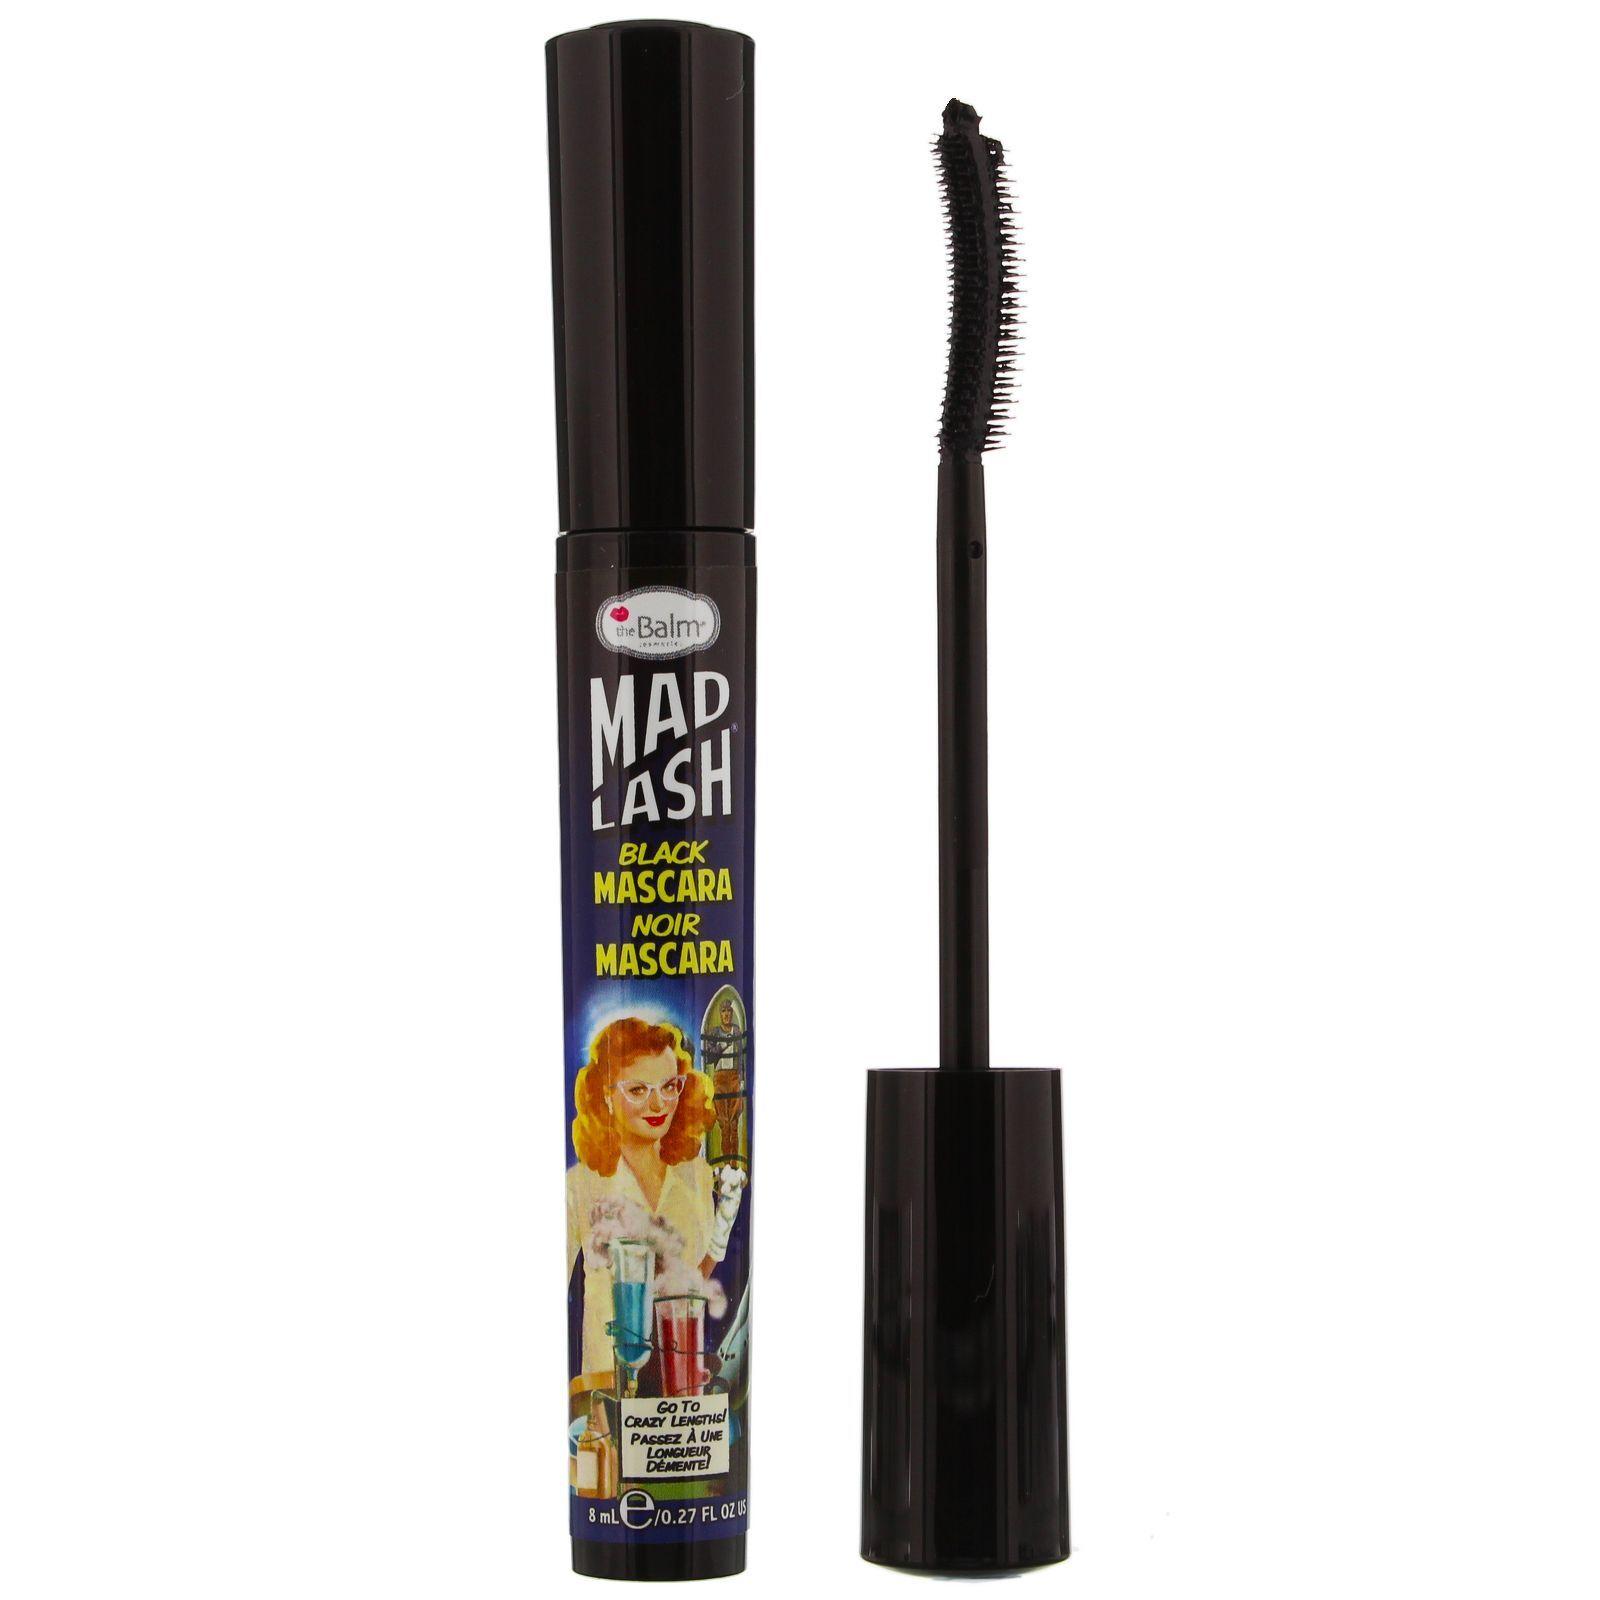 theBalm Cosmetics - Mad Lash Mascara Mad Lash Mascara for Women